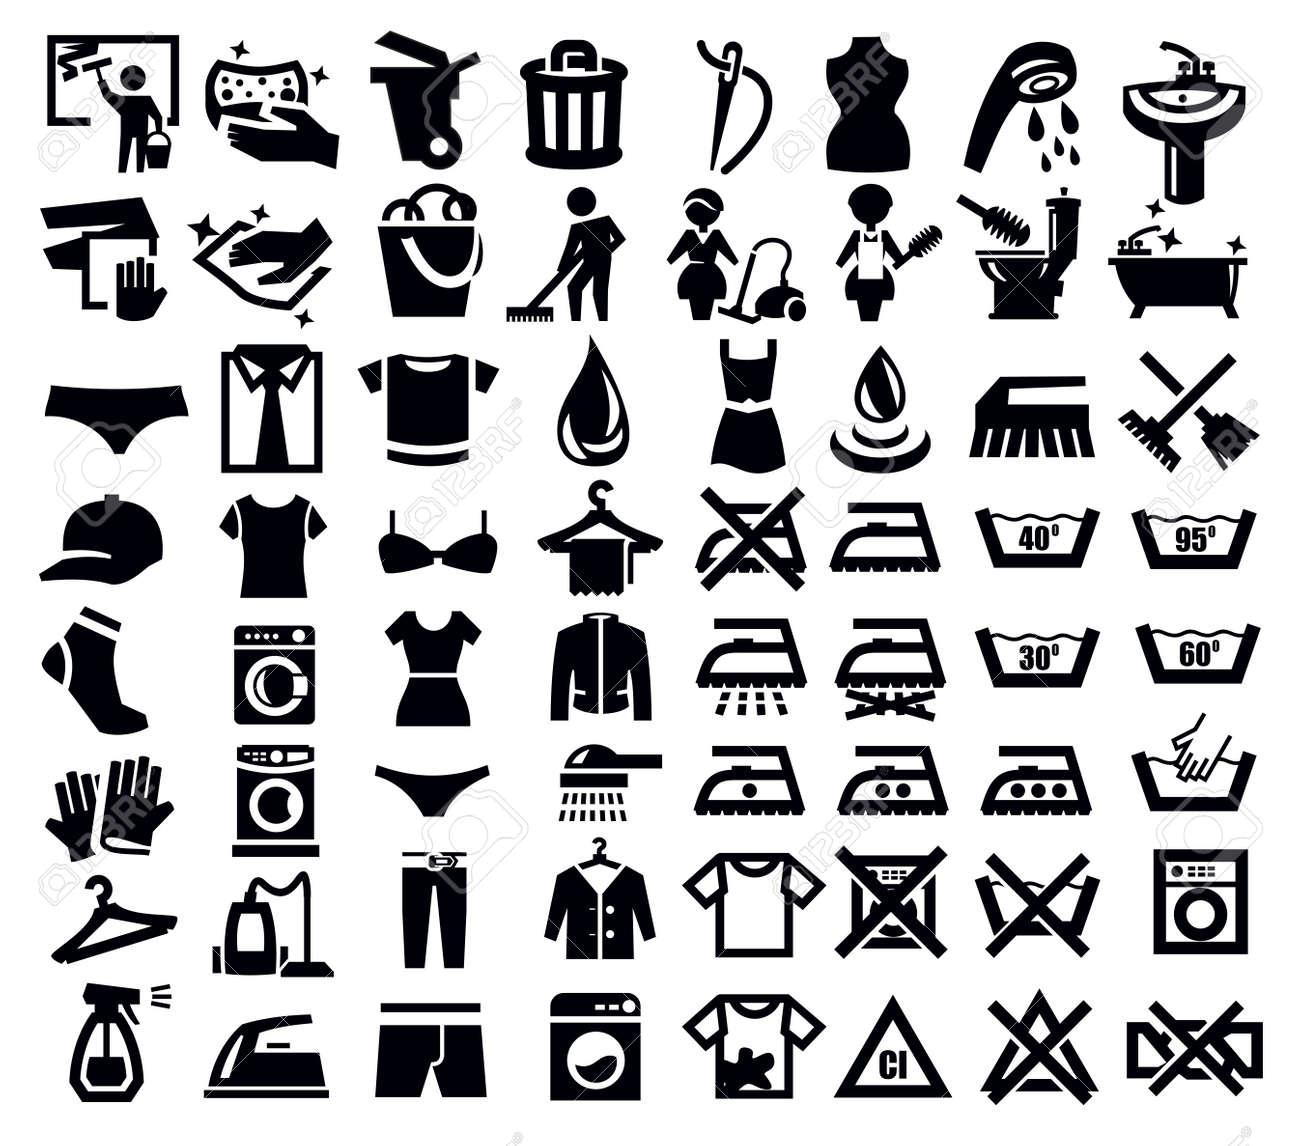 phone icons Stock Vector - 18847089